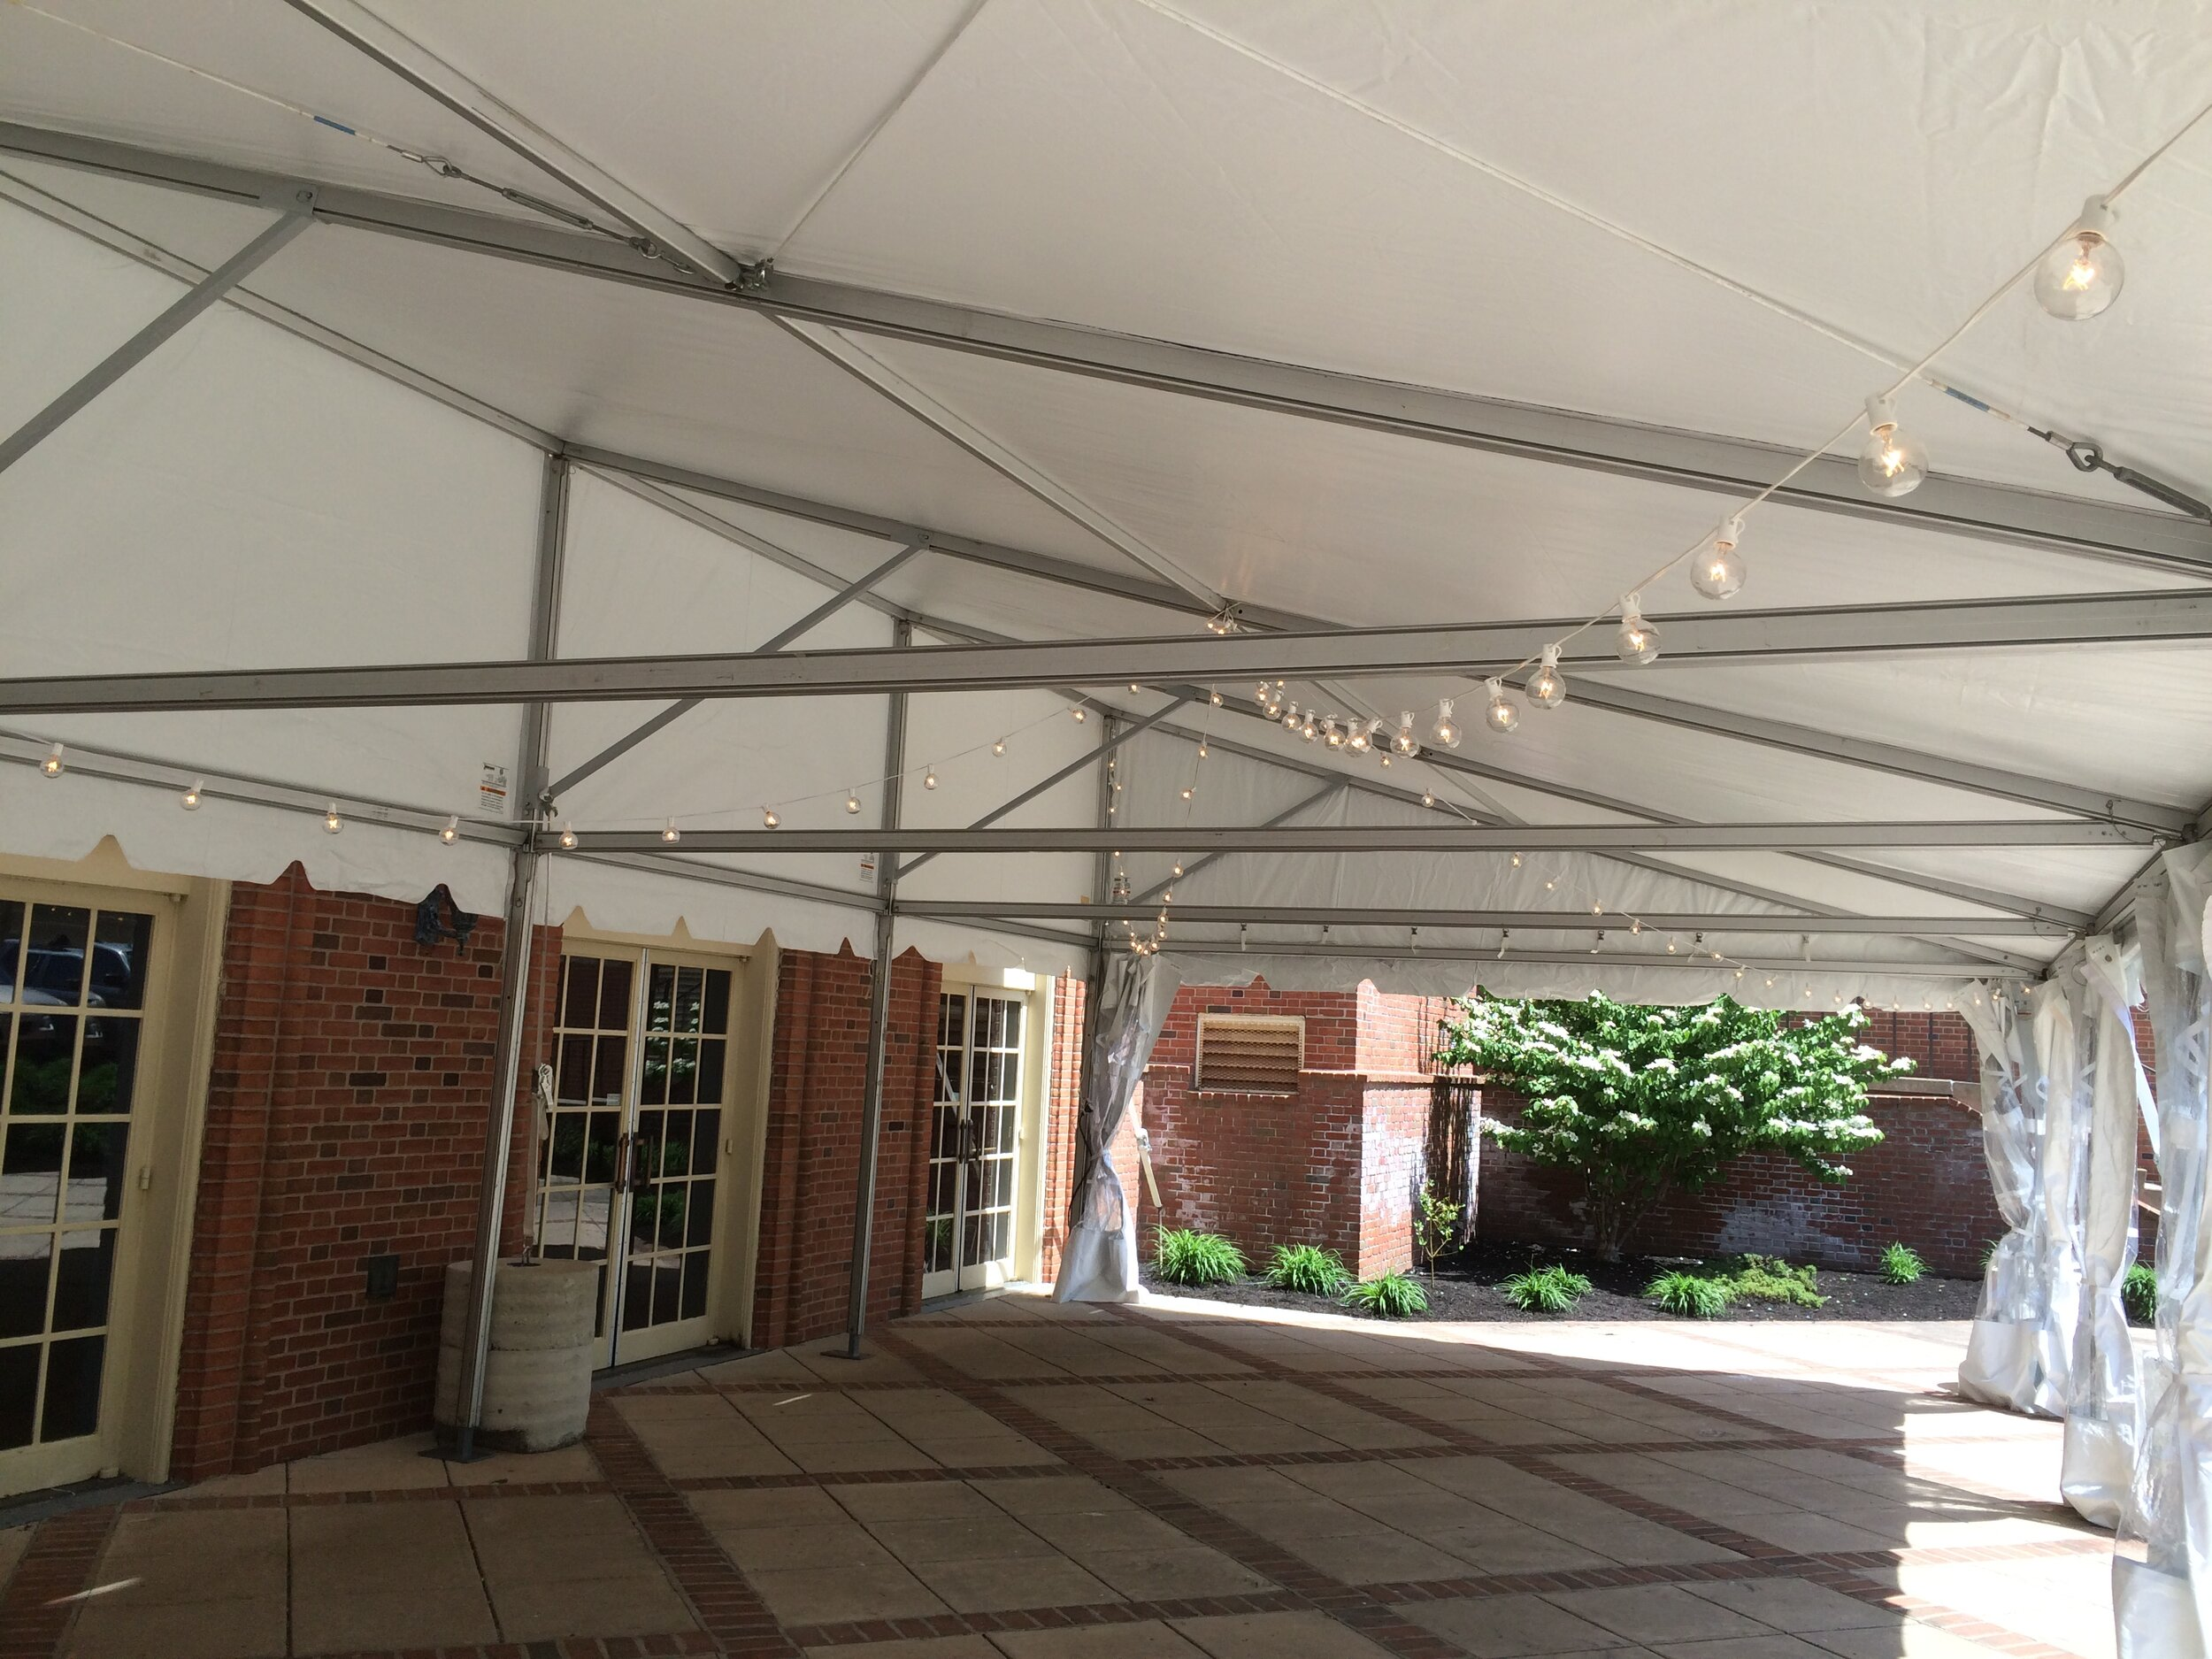 University tent installation service